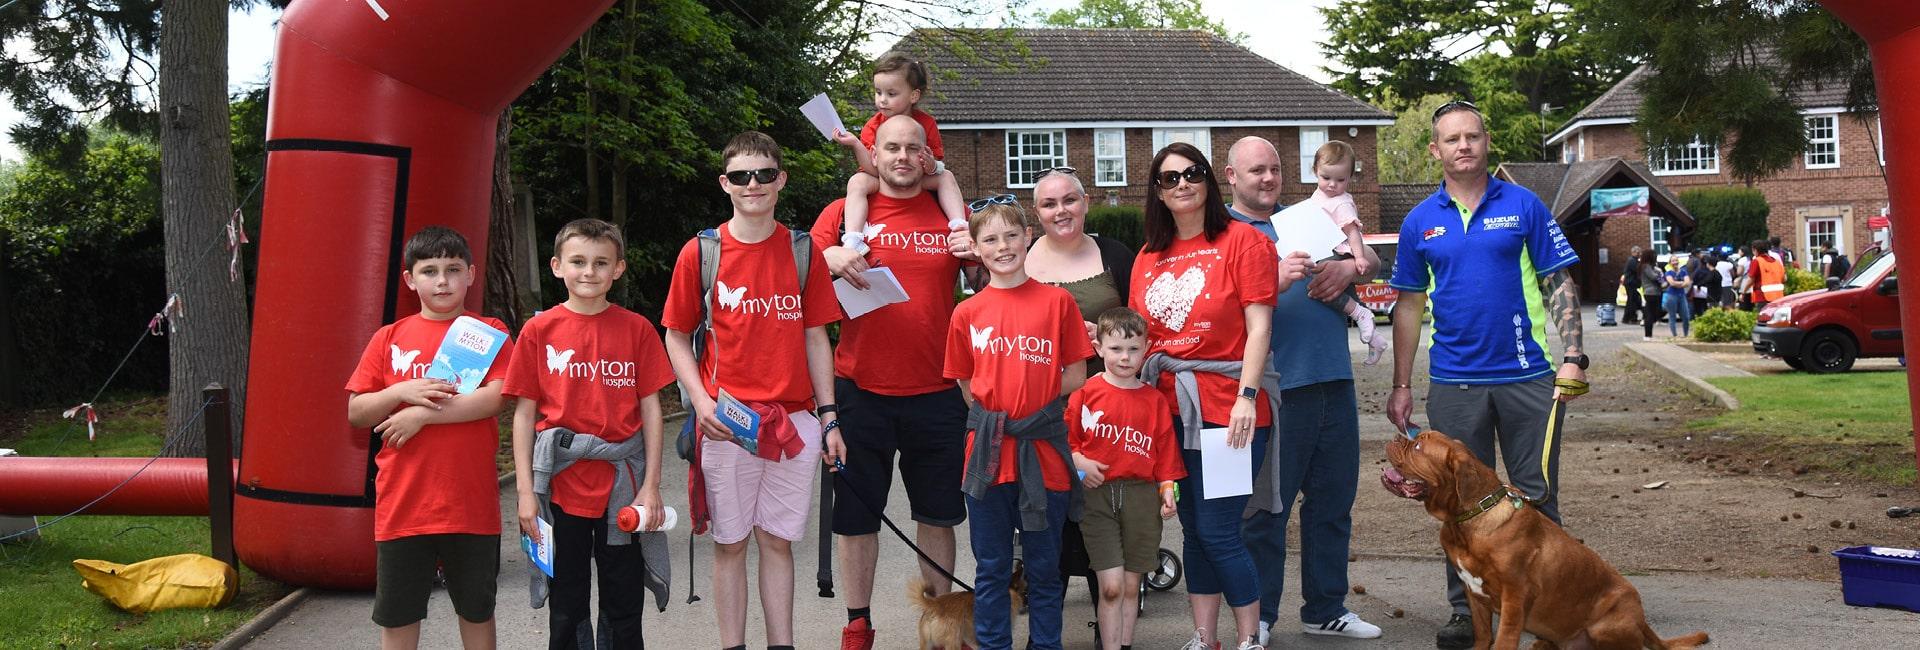 The Myton Hospices - Walk for Myton 2020 - Flex Slider